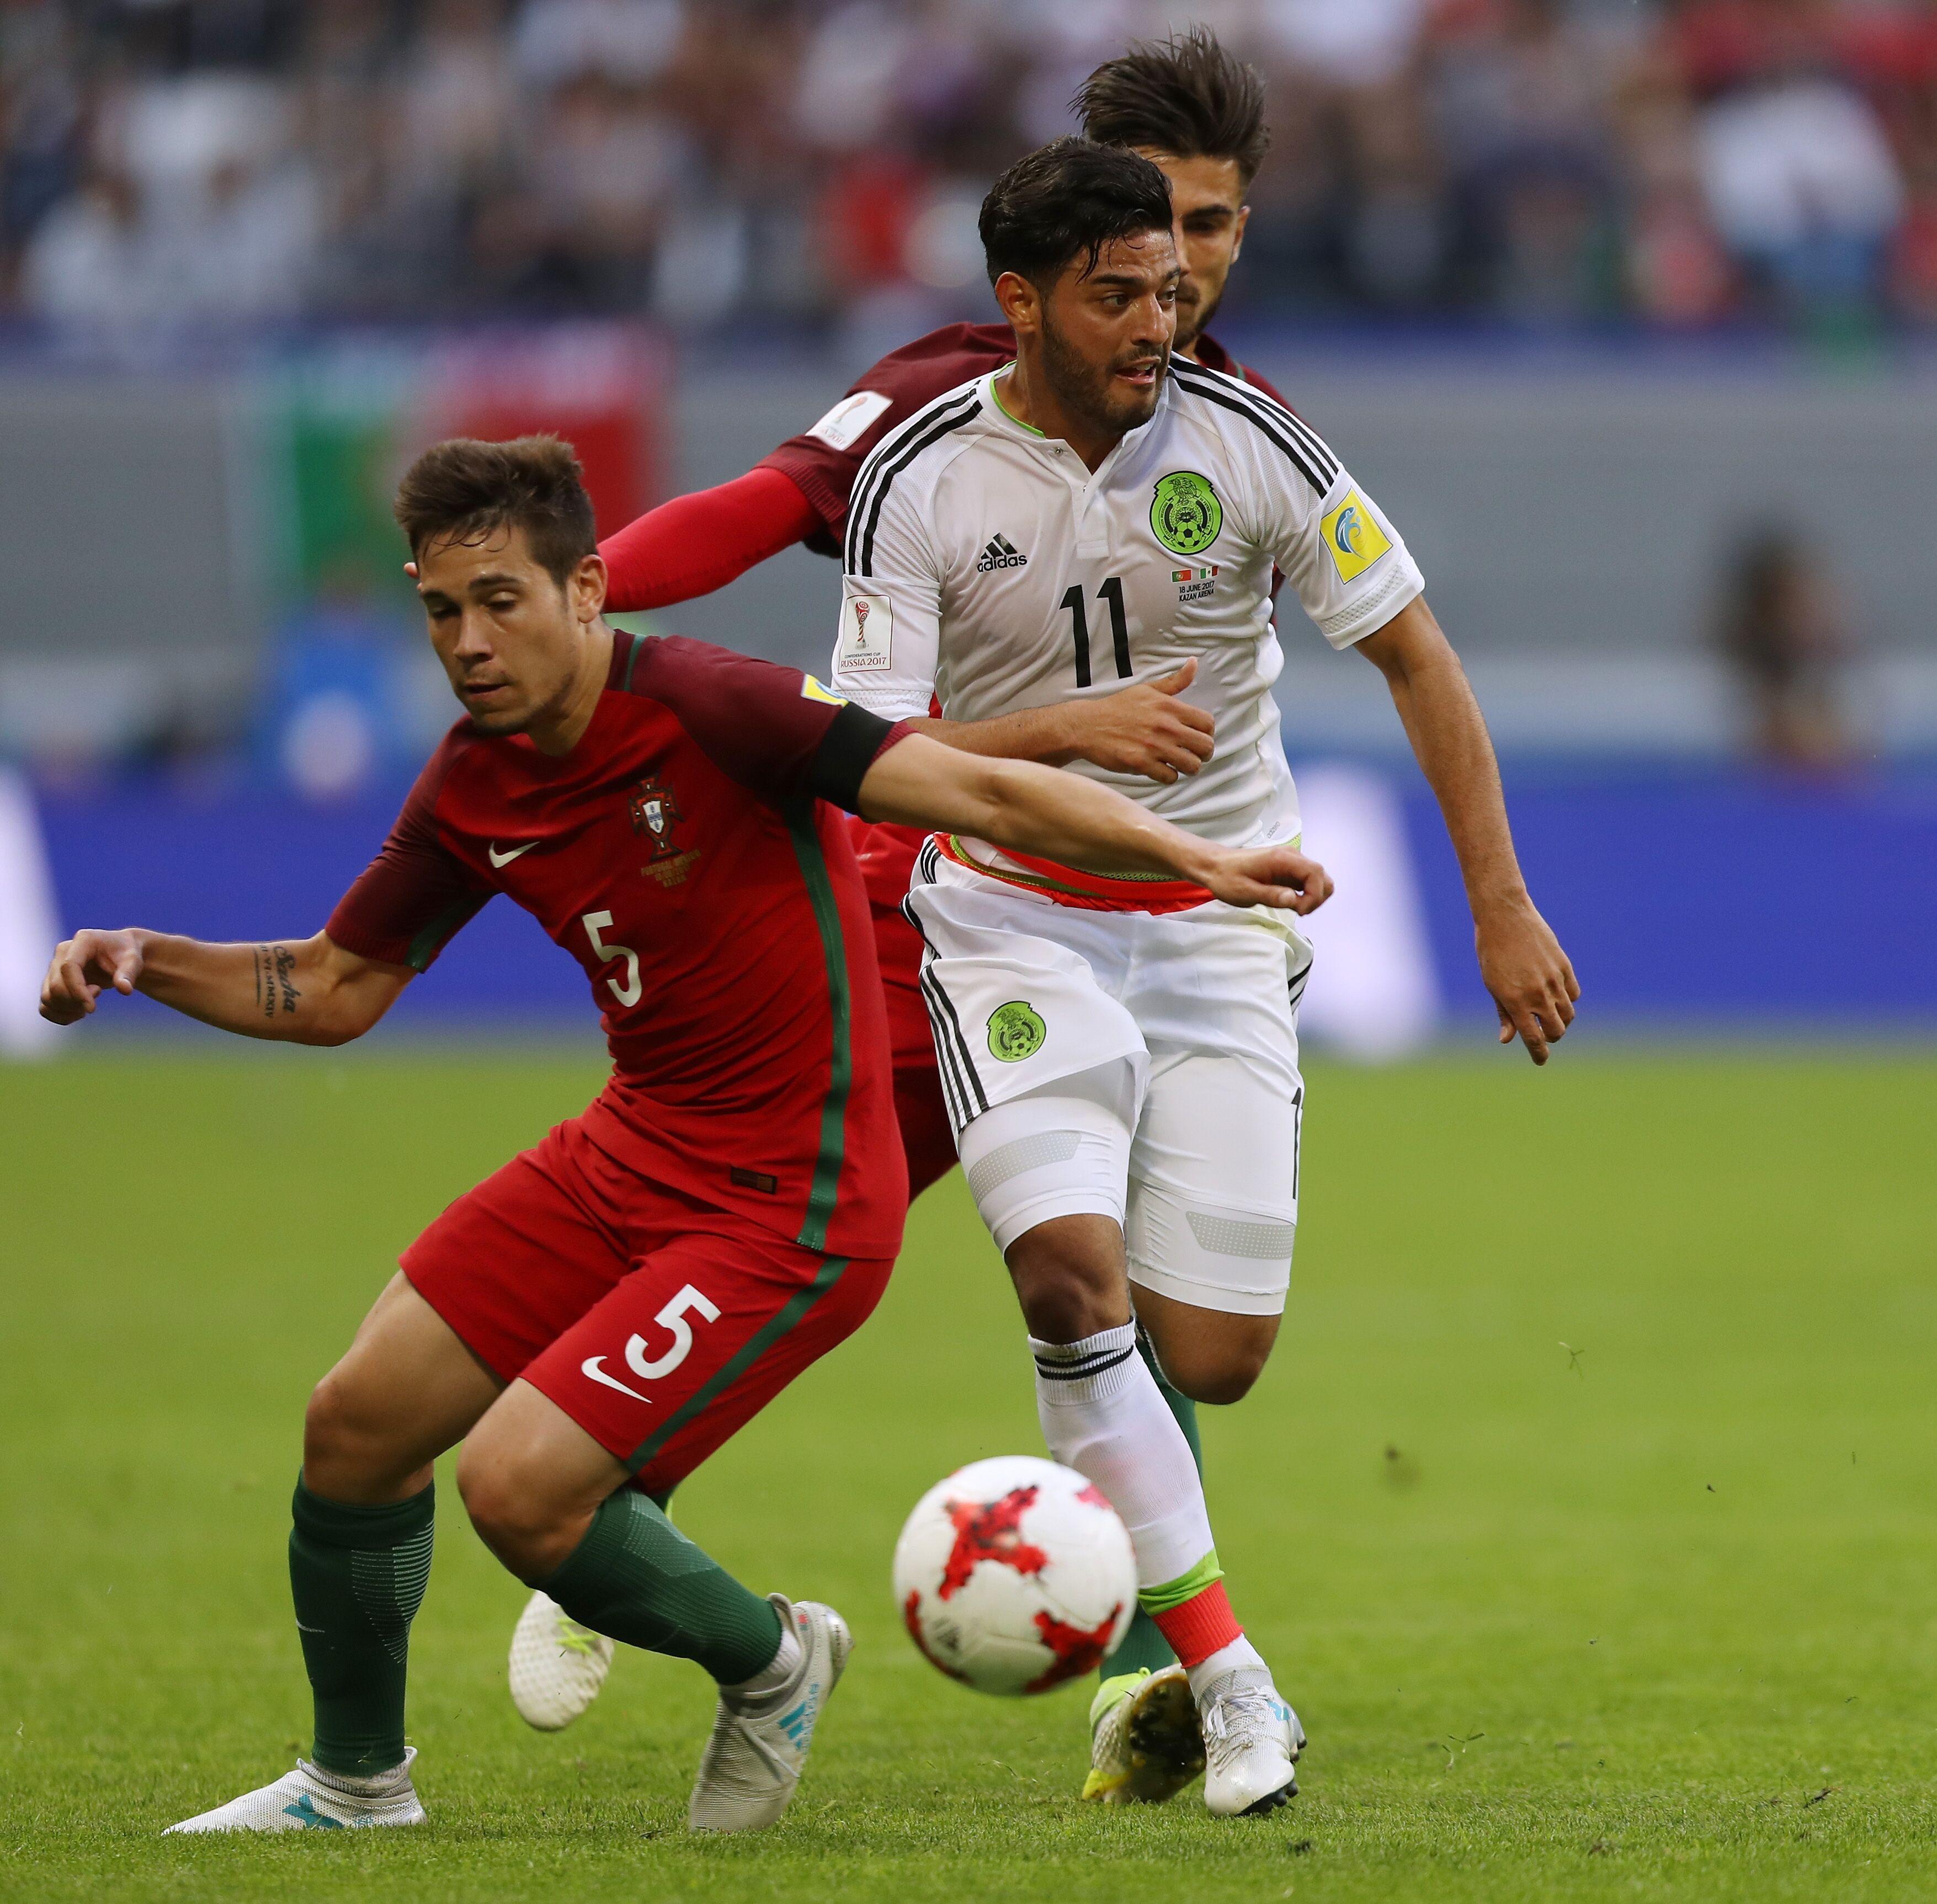 Confederations Cup Update Borussia Dortmund s Raphael Stumbles